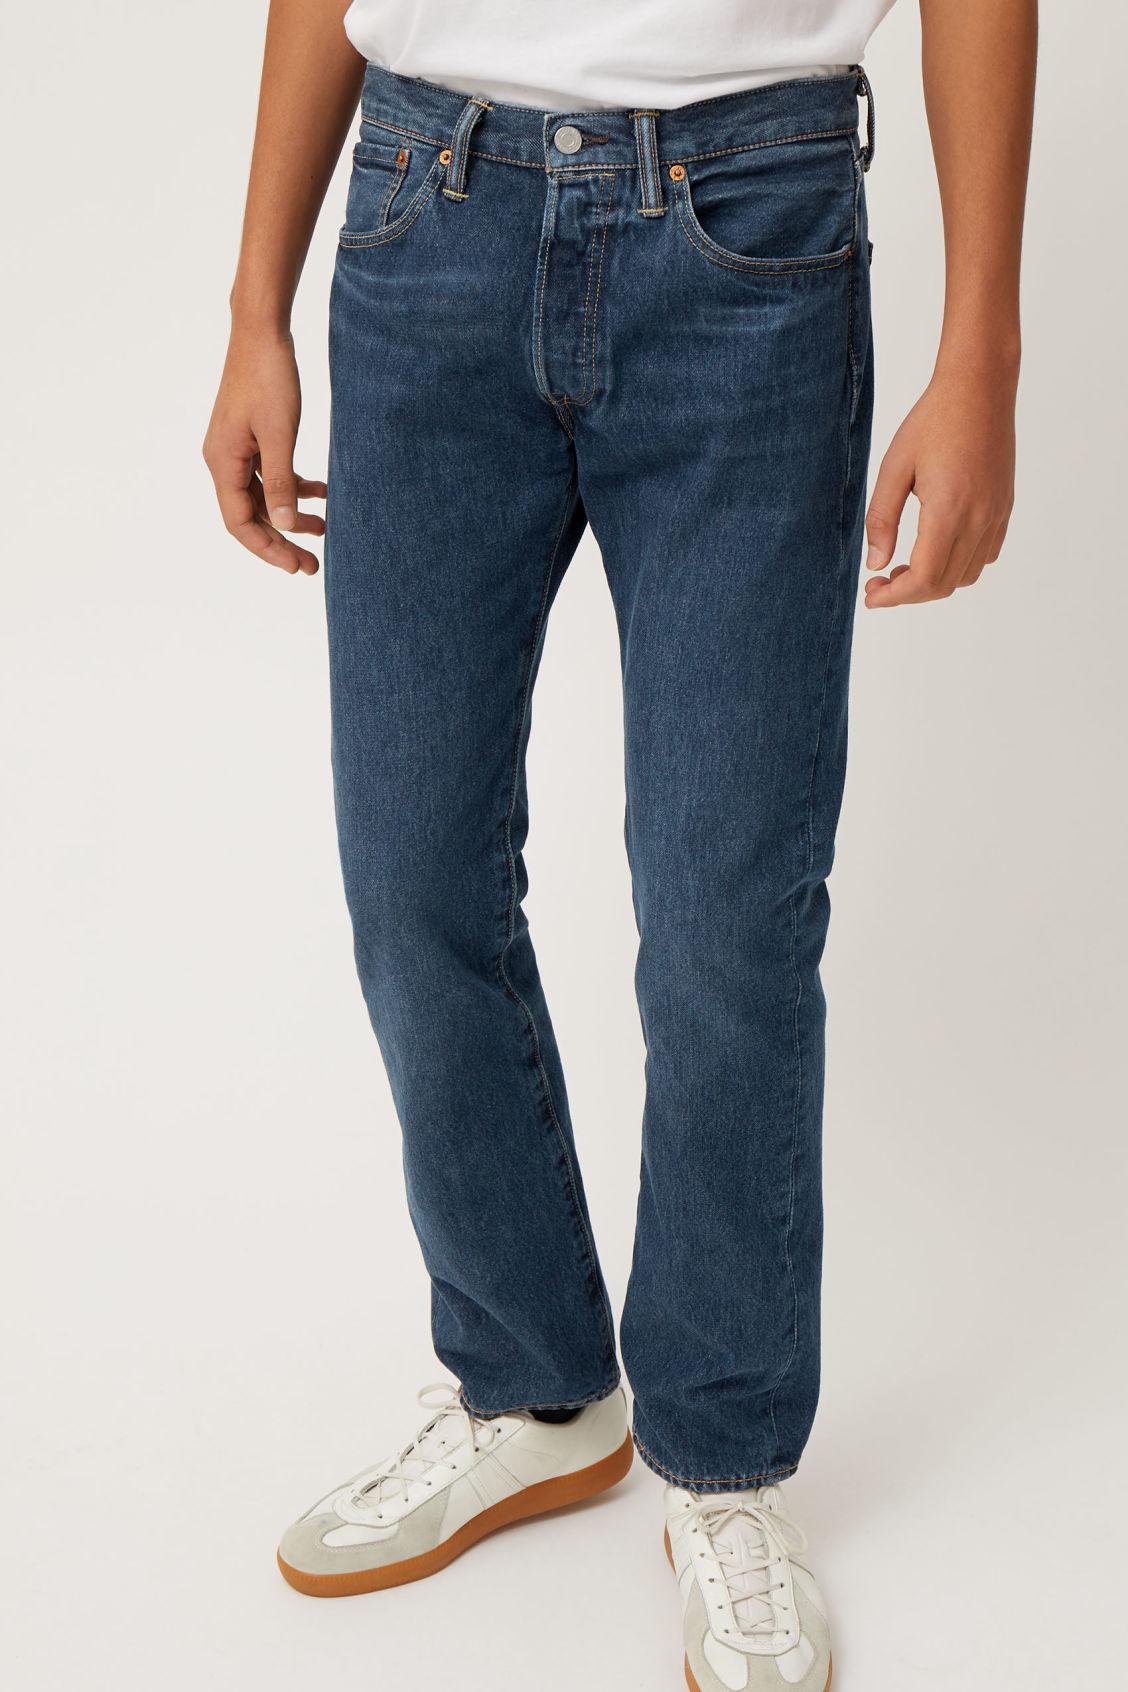 Weekday Sub Blue Station 501 Jeans Original MUzVGpqS